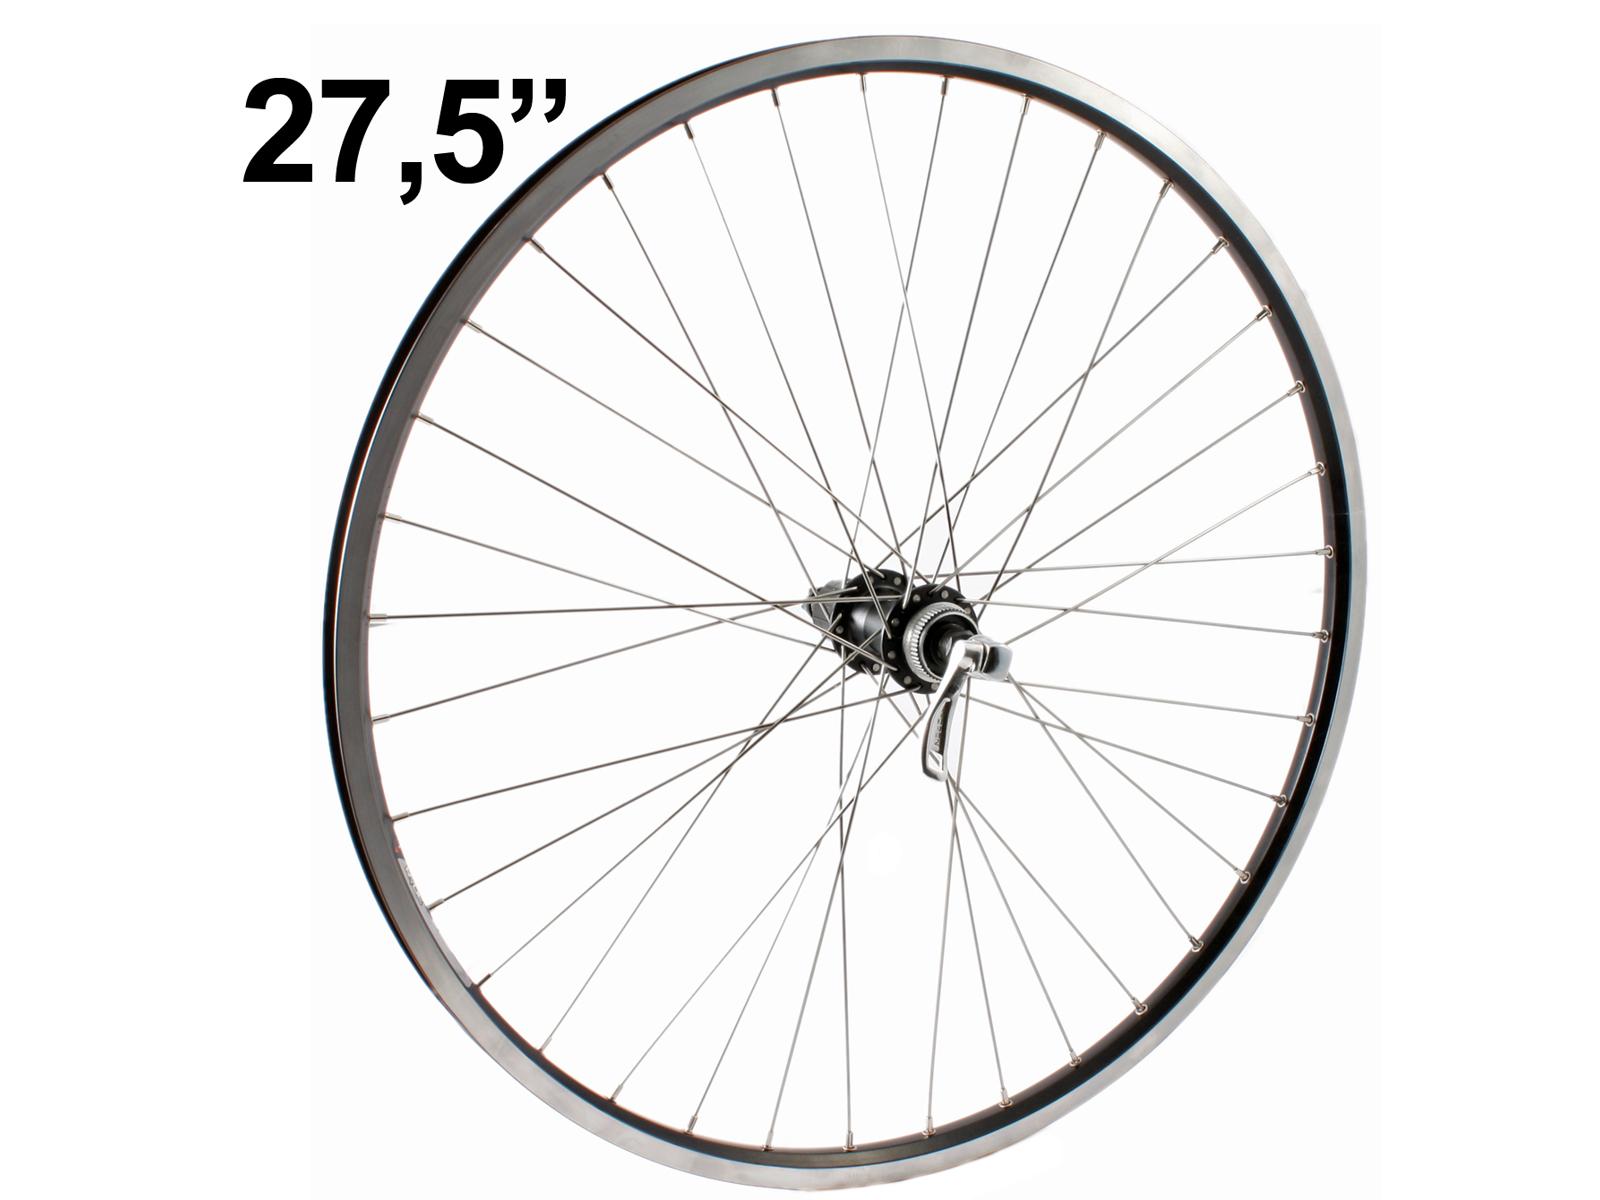 "Hjul til MTB cykler 27,5"" / 650B"